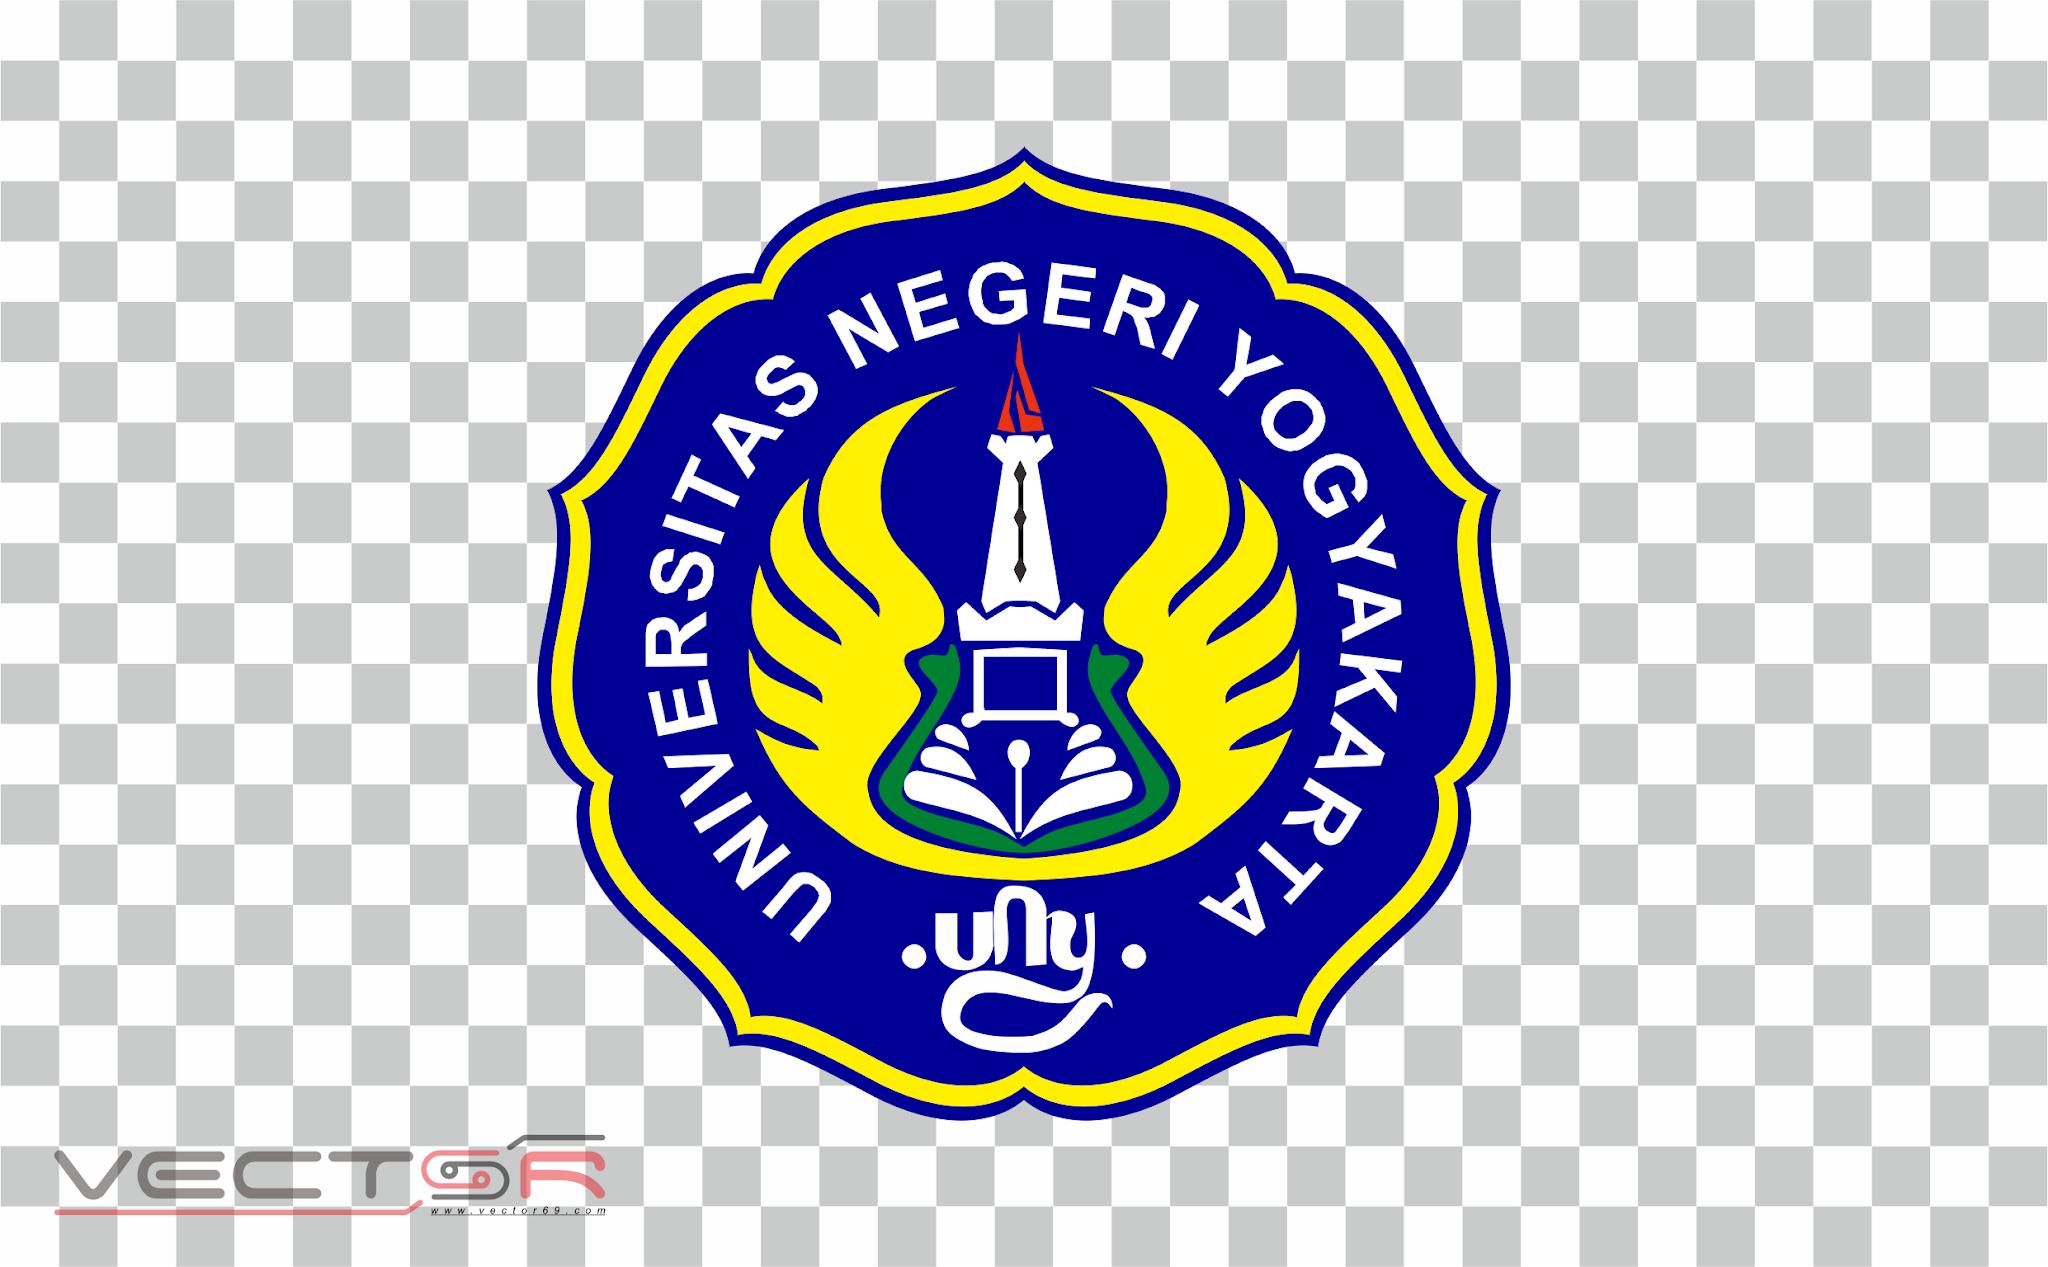 Logo UNY (Universitas Negeri Yogyakarta) - Download .PNG (Portable Network Graphics) Transparent Images